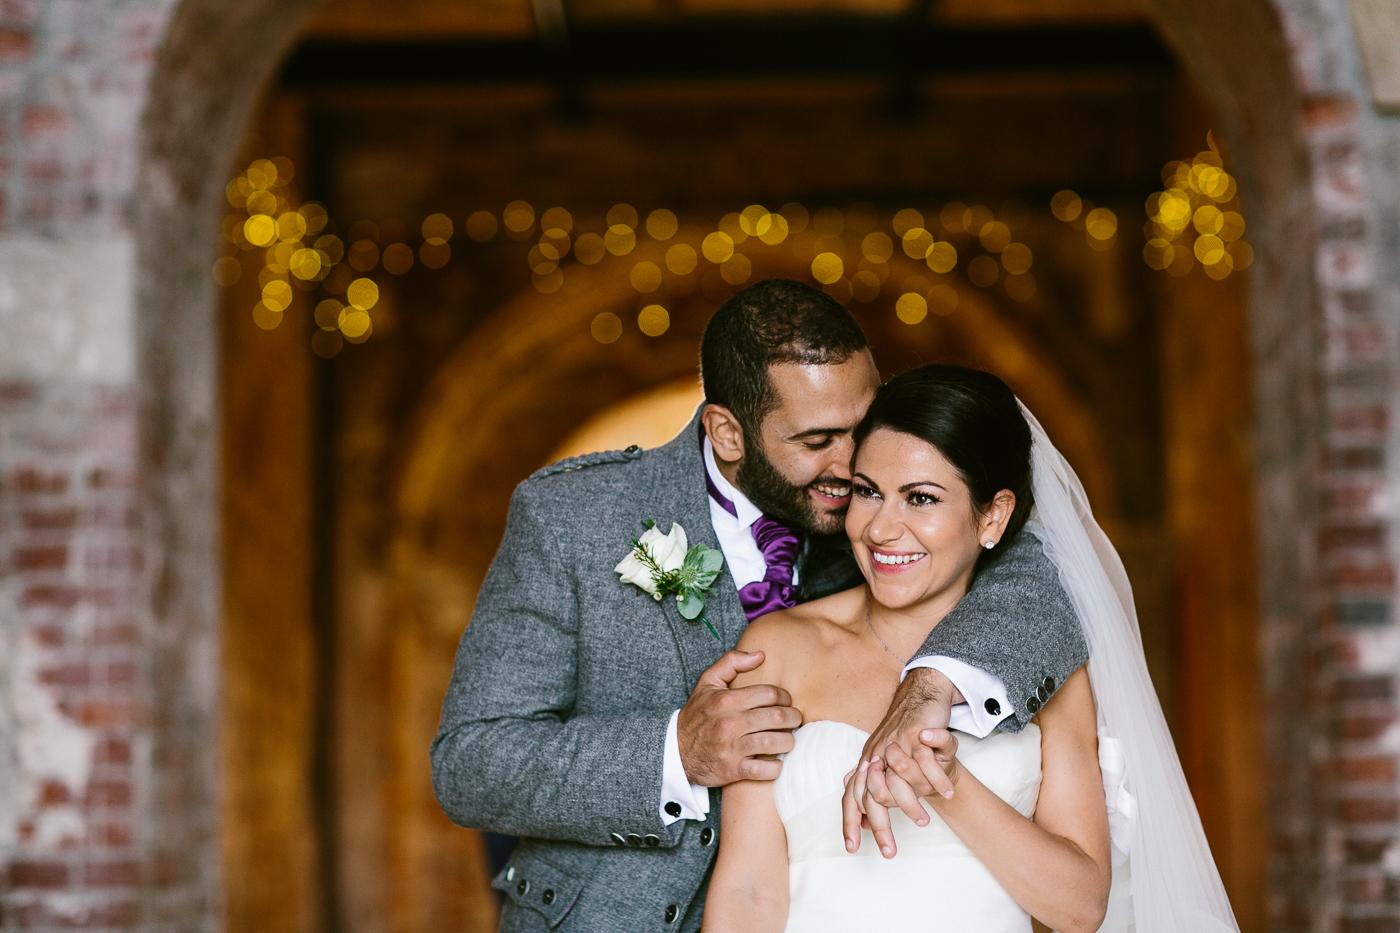 lulworth castle wedding photos testimonial